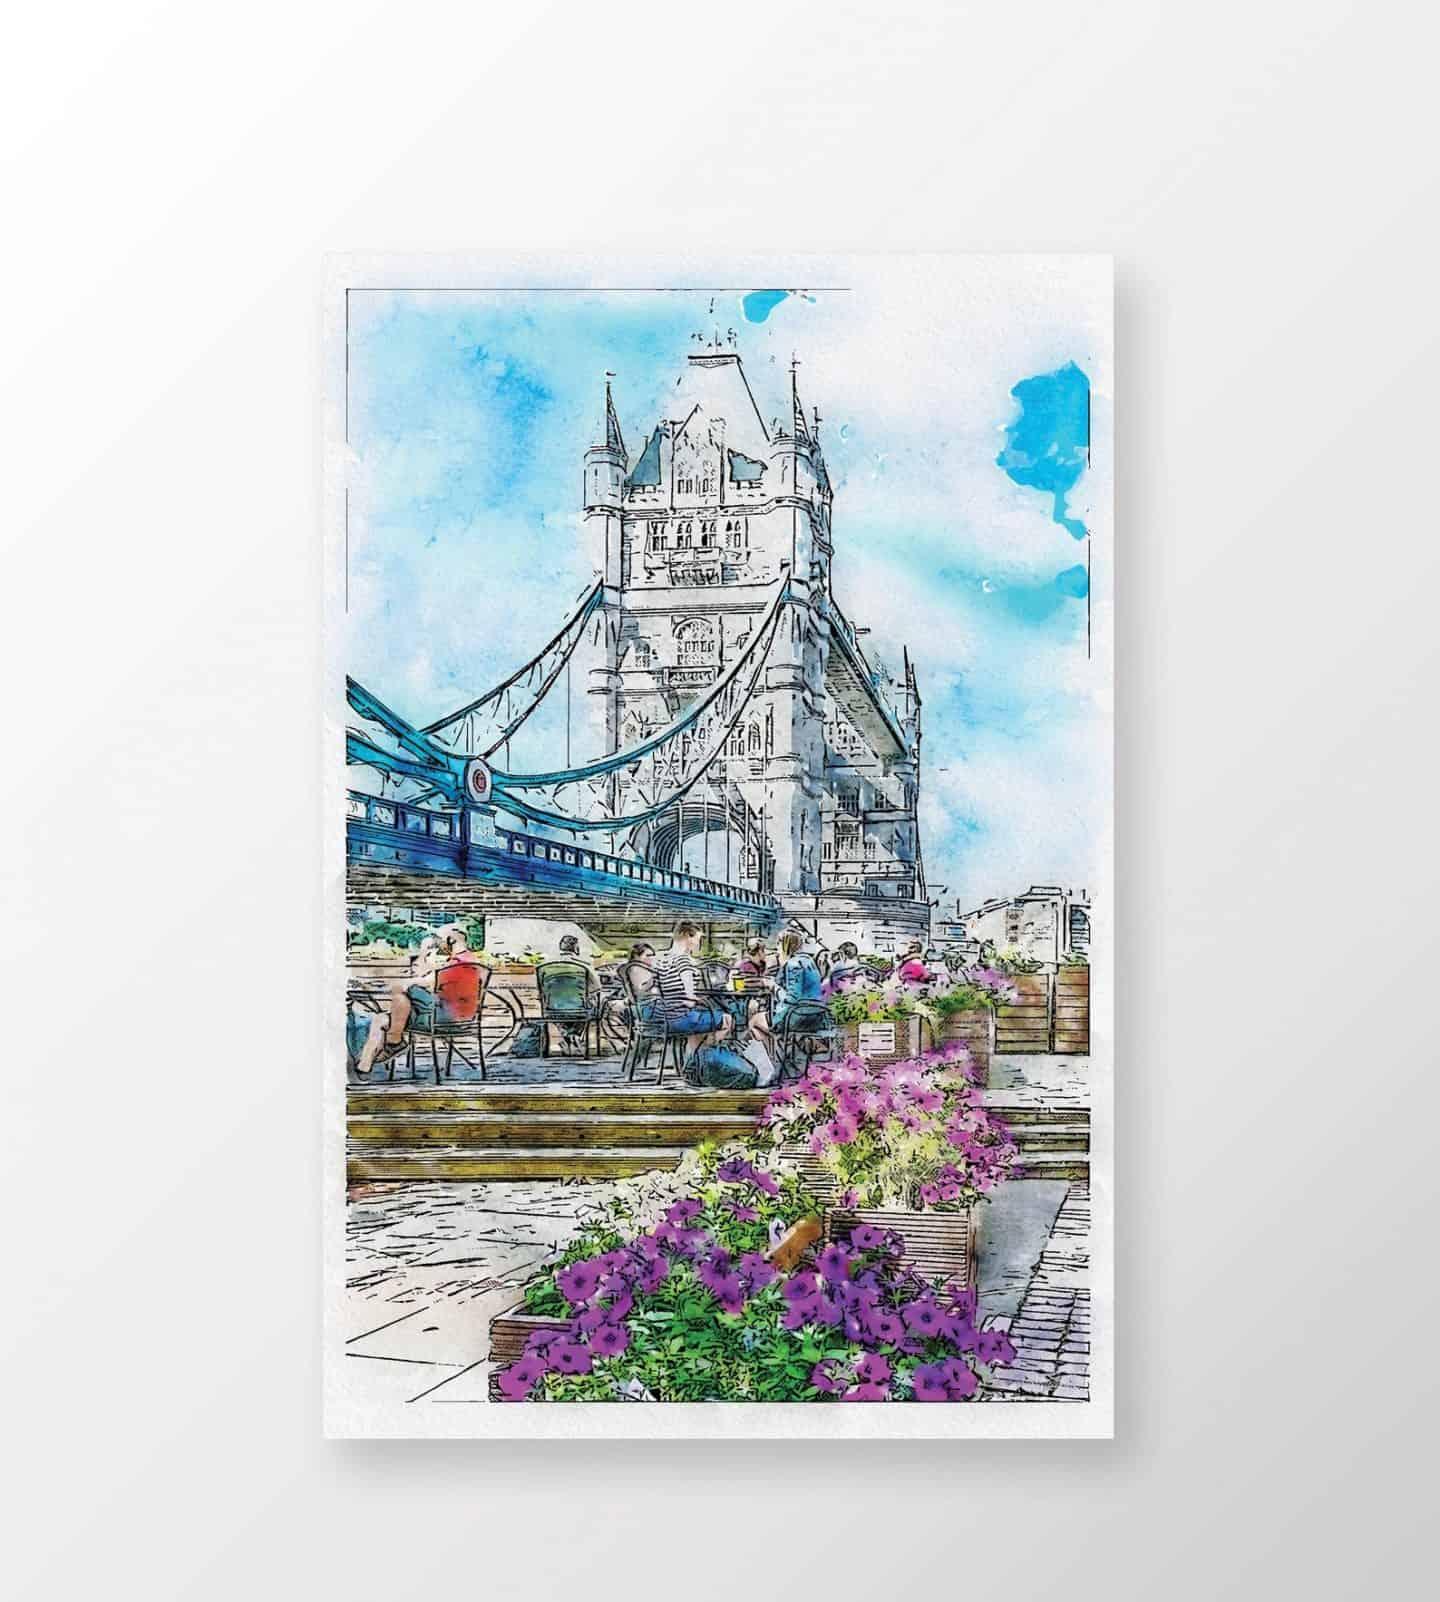 Tower-Bridge-Watercolor-Wall-Art